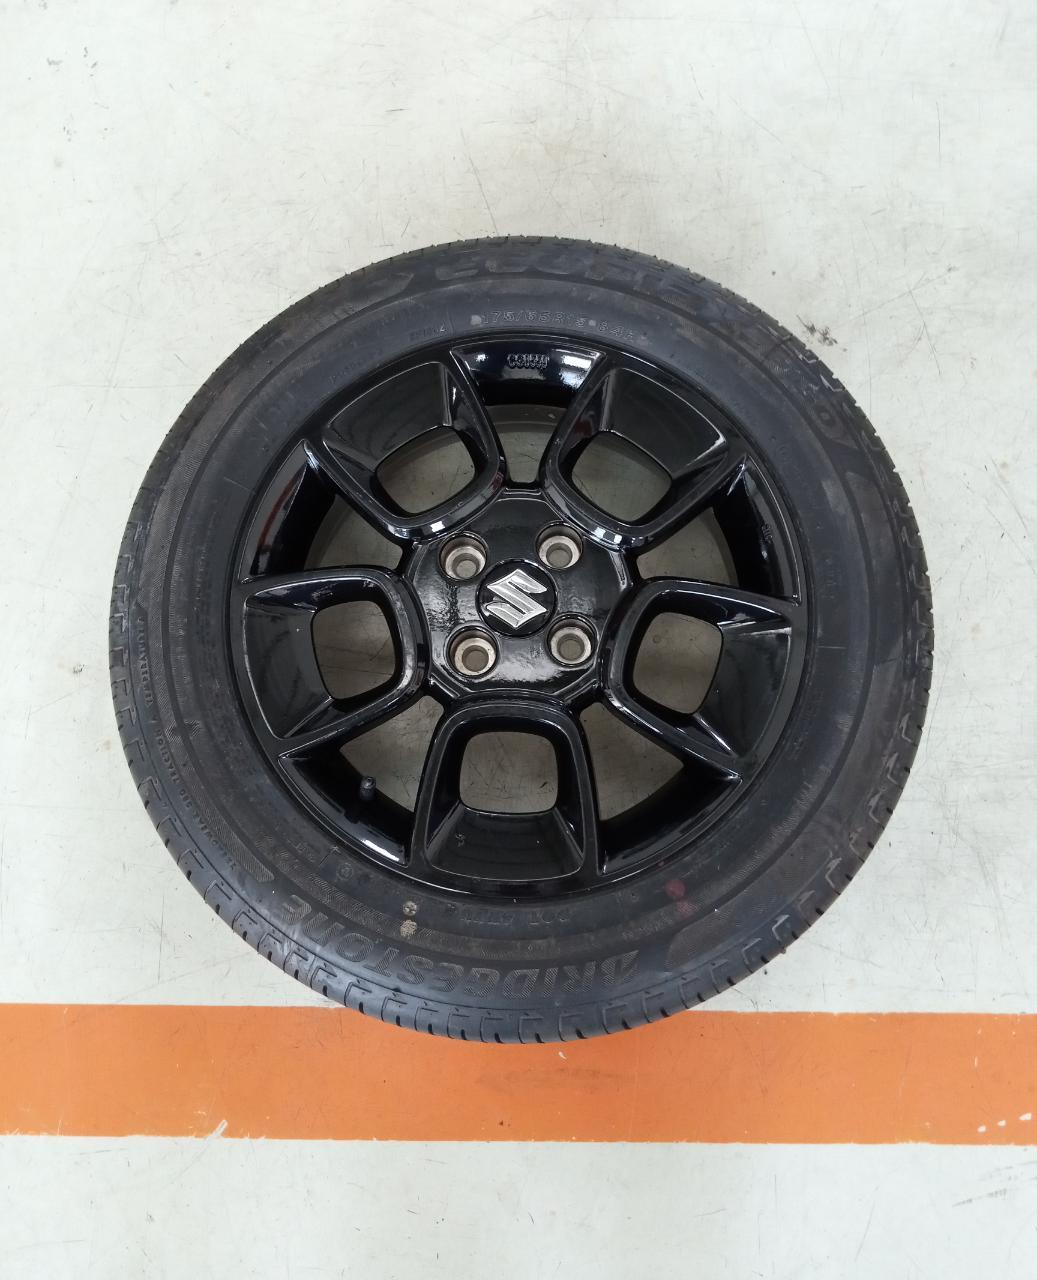 Velg Bekas Oem Suzuki Ignis Ring 15 + Ban Bridgestone 175/65/R15